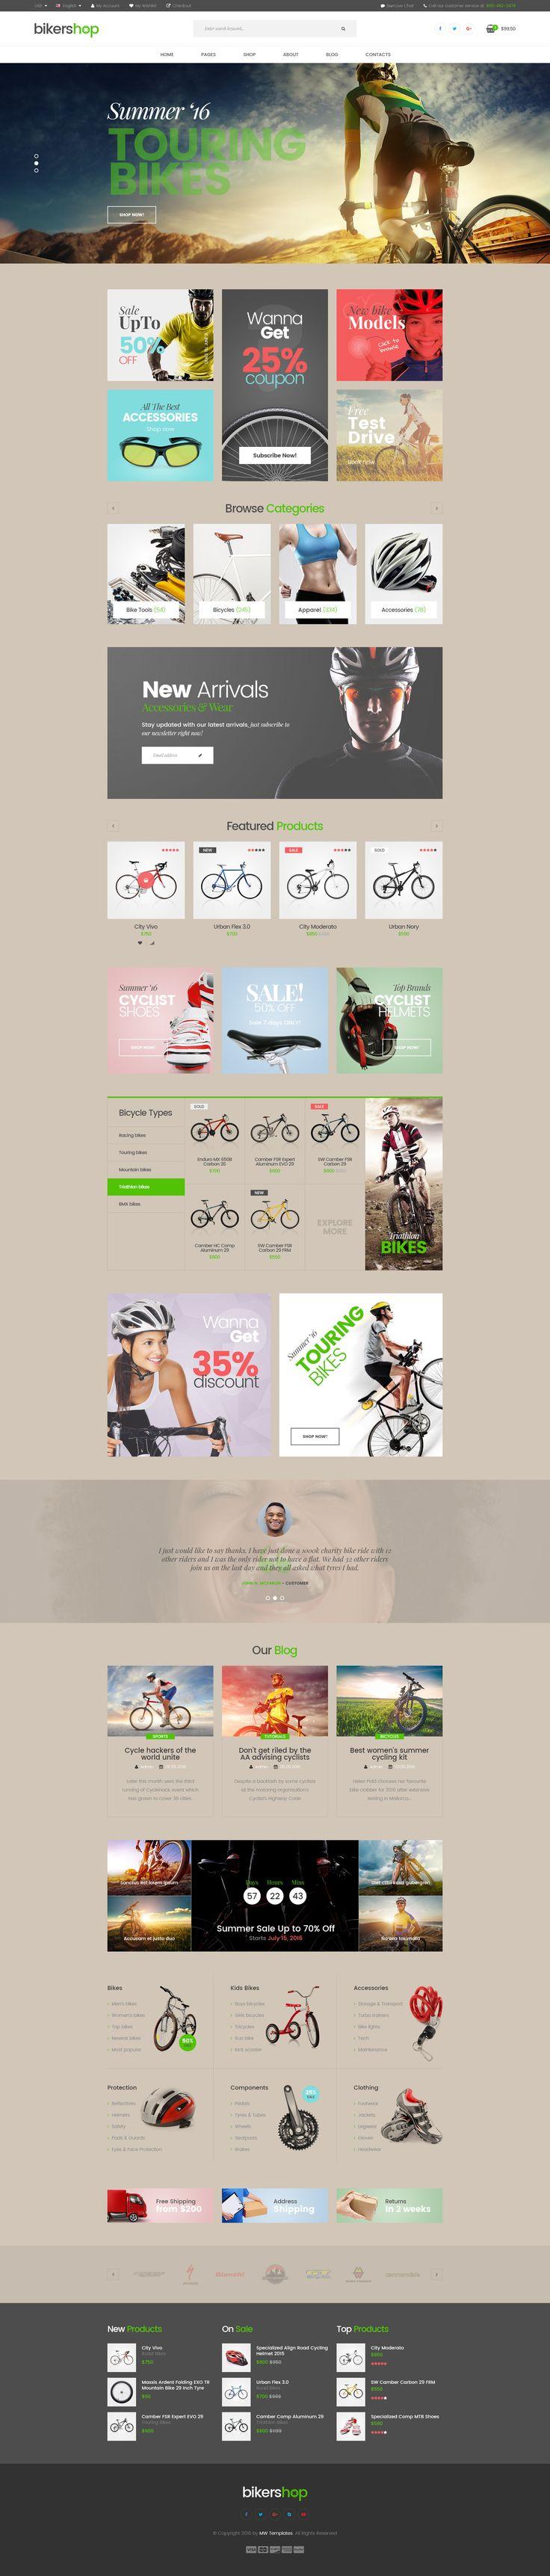 Biker Shop is a simple and functional PSD template | Download: https://themeforest.net/item/biker-shop-premium-psd-template/16757338?ref=sinzo